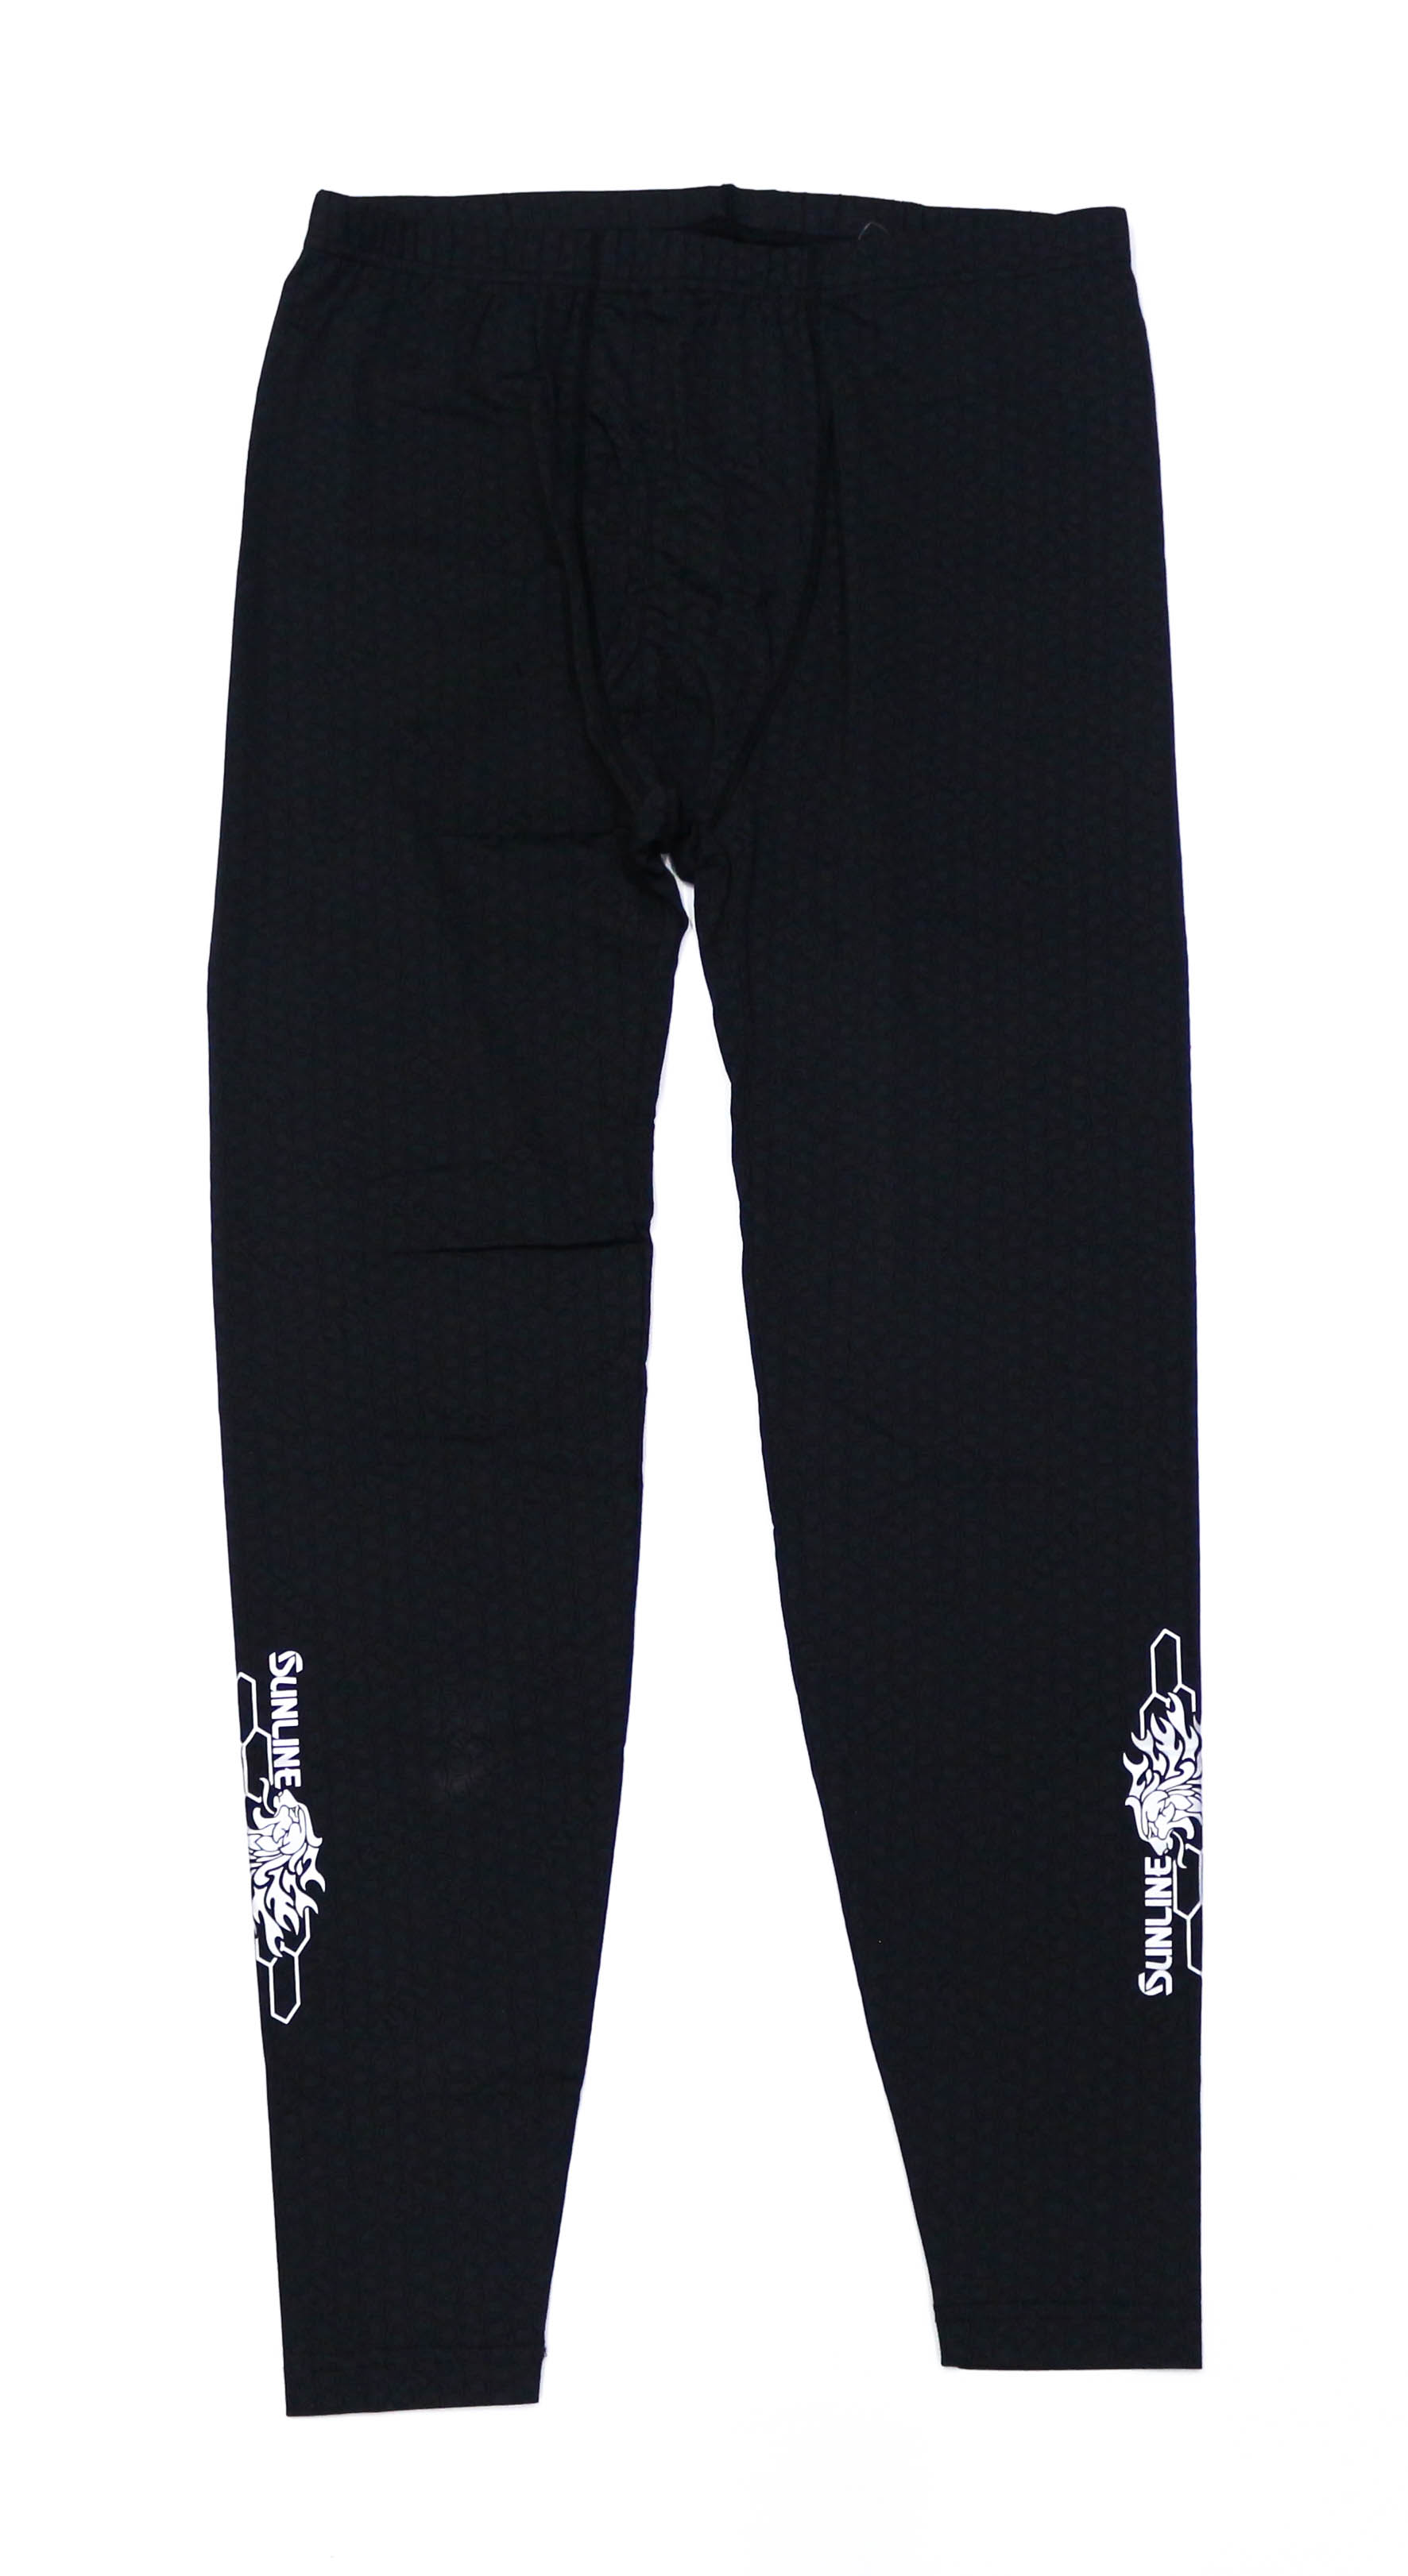 Sunline SUW-5536CW Underpants Terax Cool Black Size M (2471)